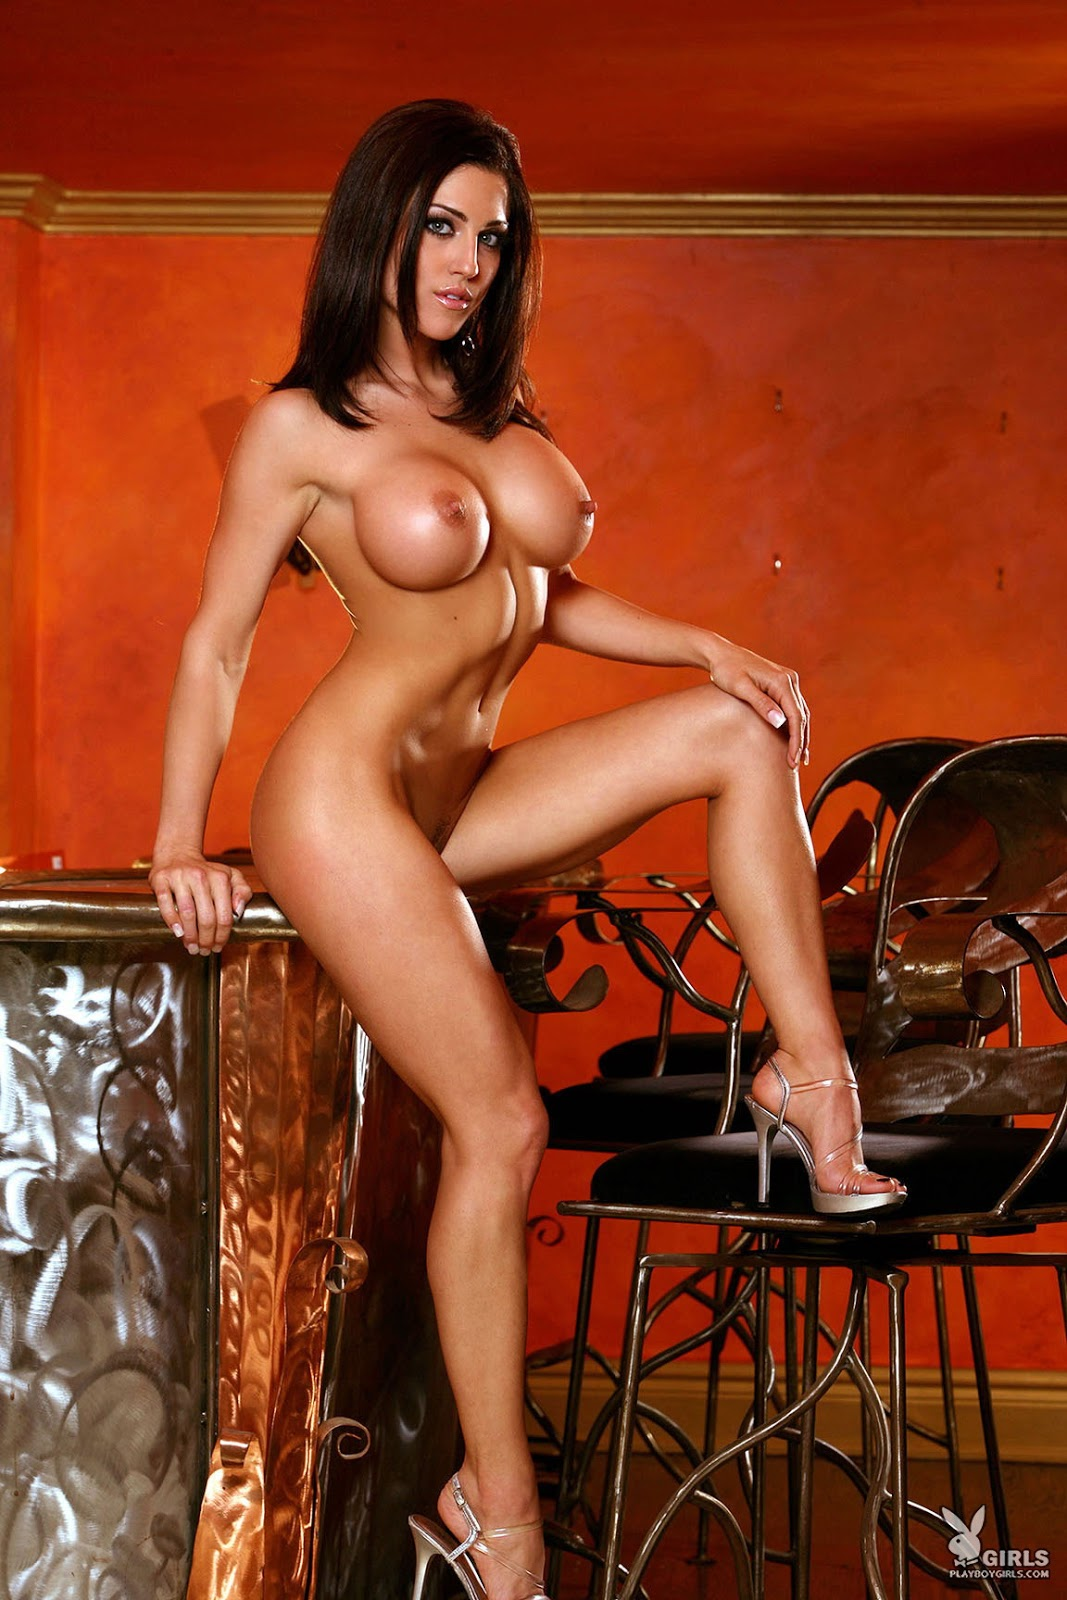 Amazing nude bodies sex good topic